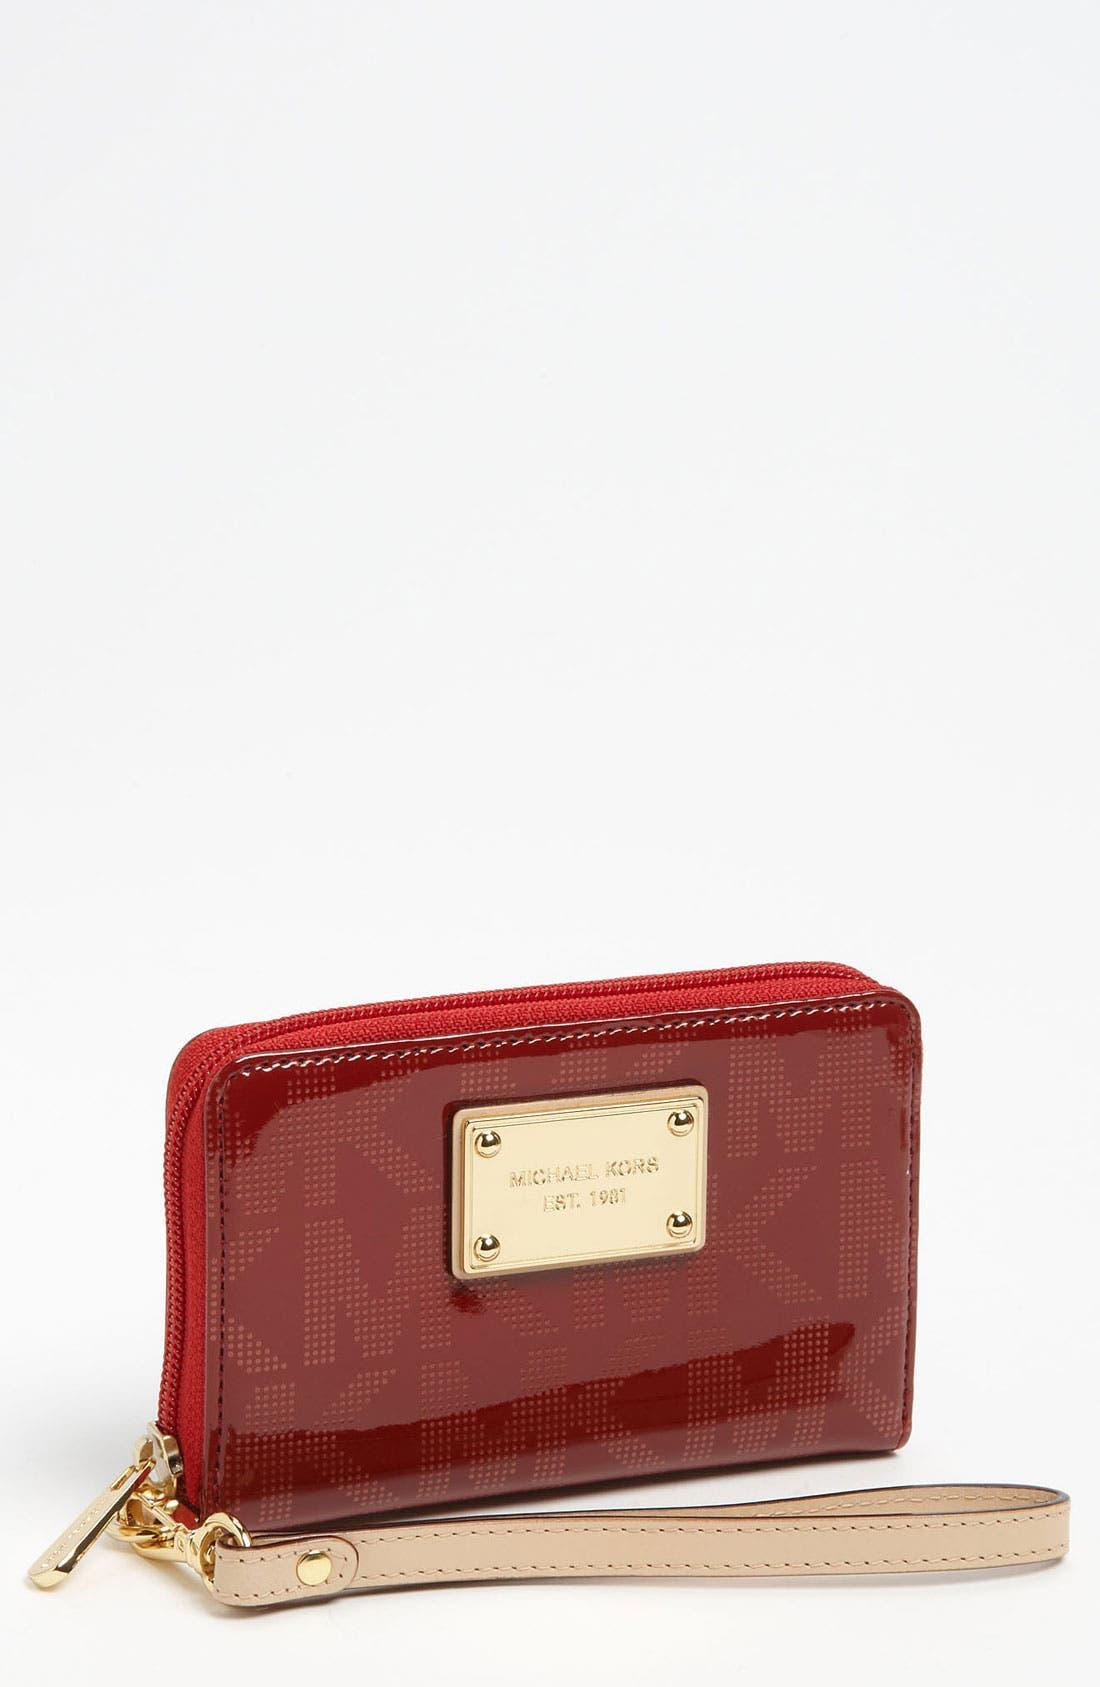 Main Image - MICHAEL Michael Kors 'Signature' Phone Wristlet